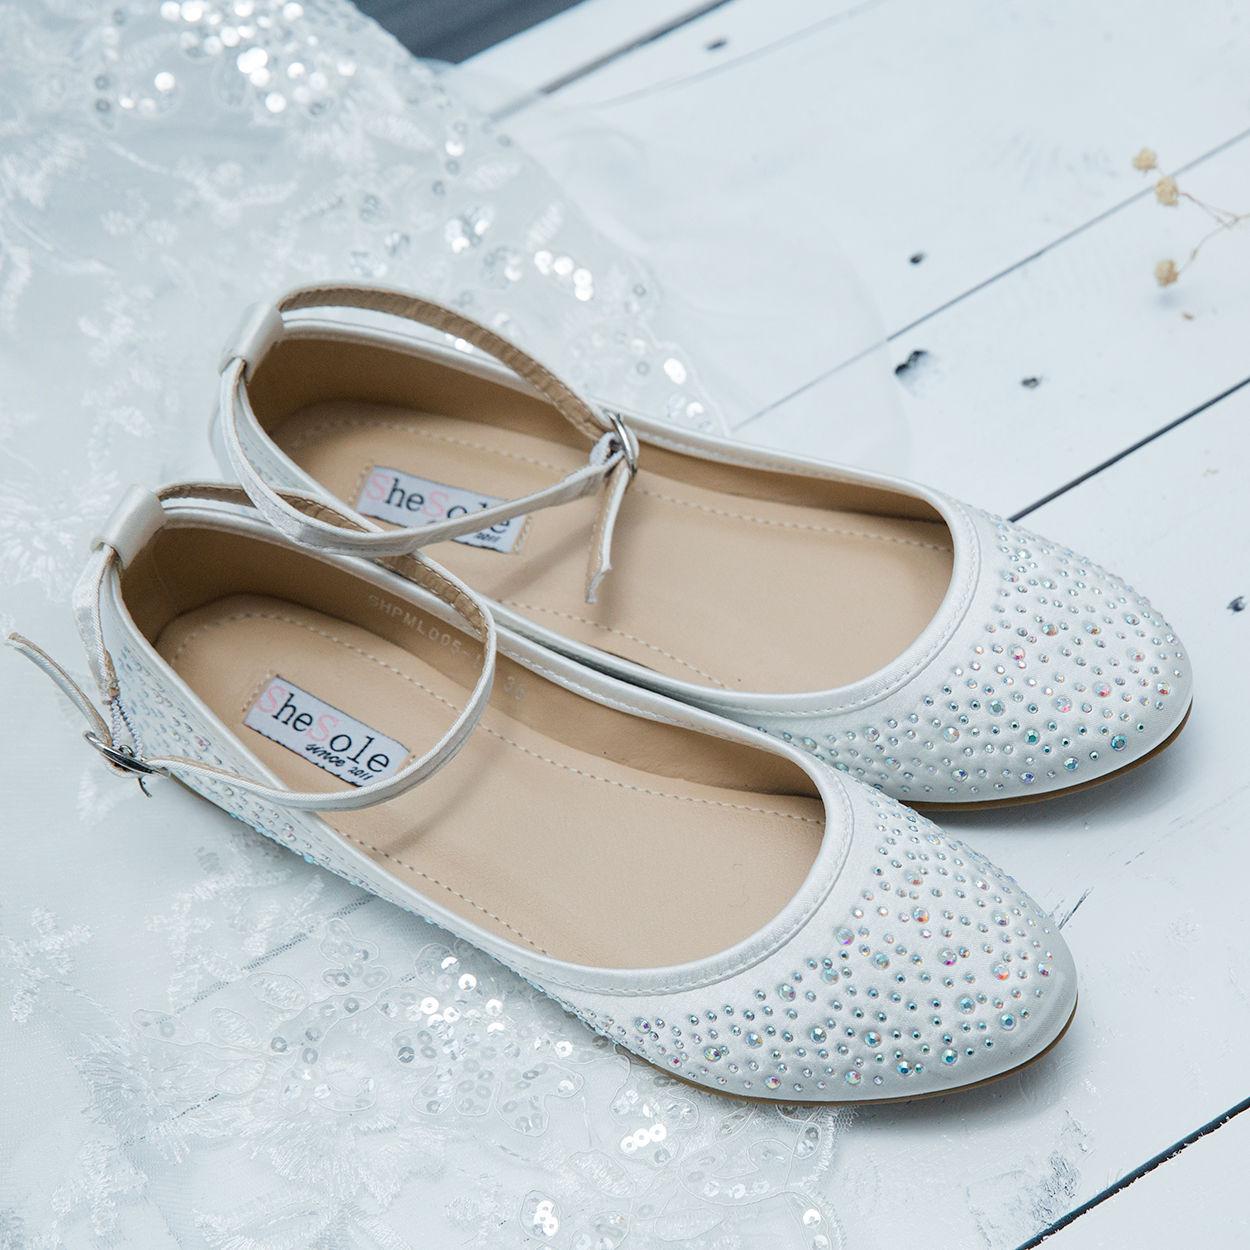 SheSole Womens Ballet Wedding Flats Bridal Flat Shoes Size   eBay